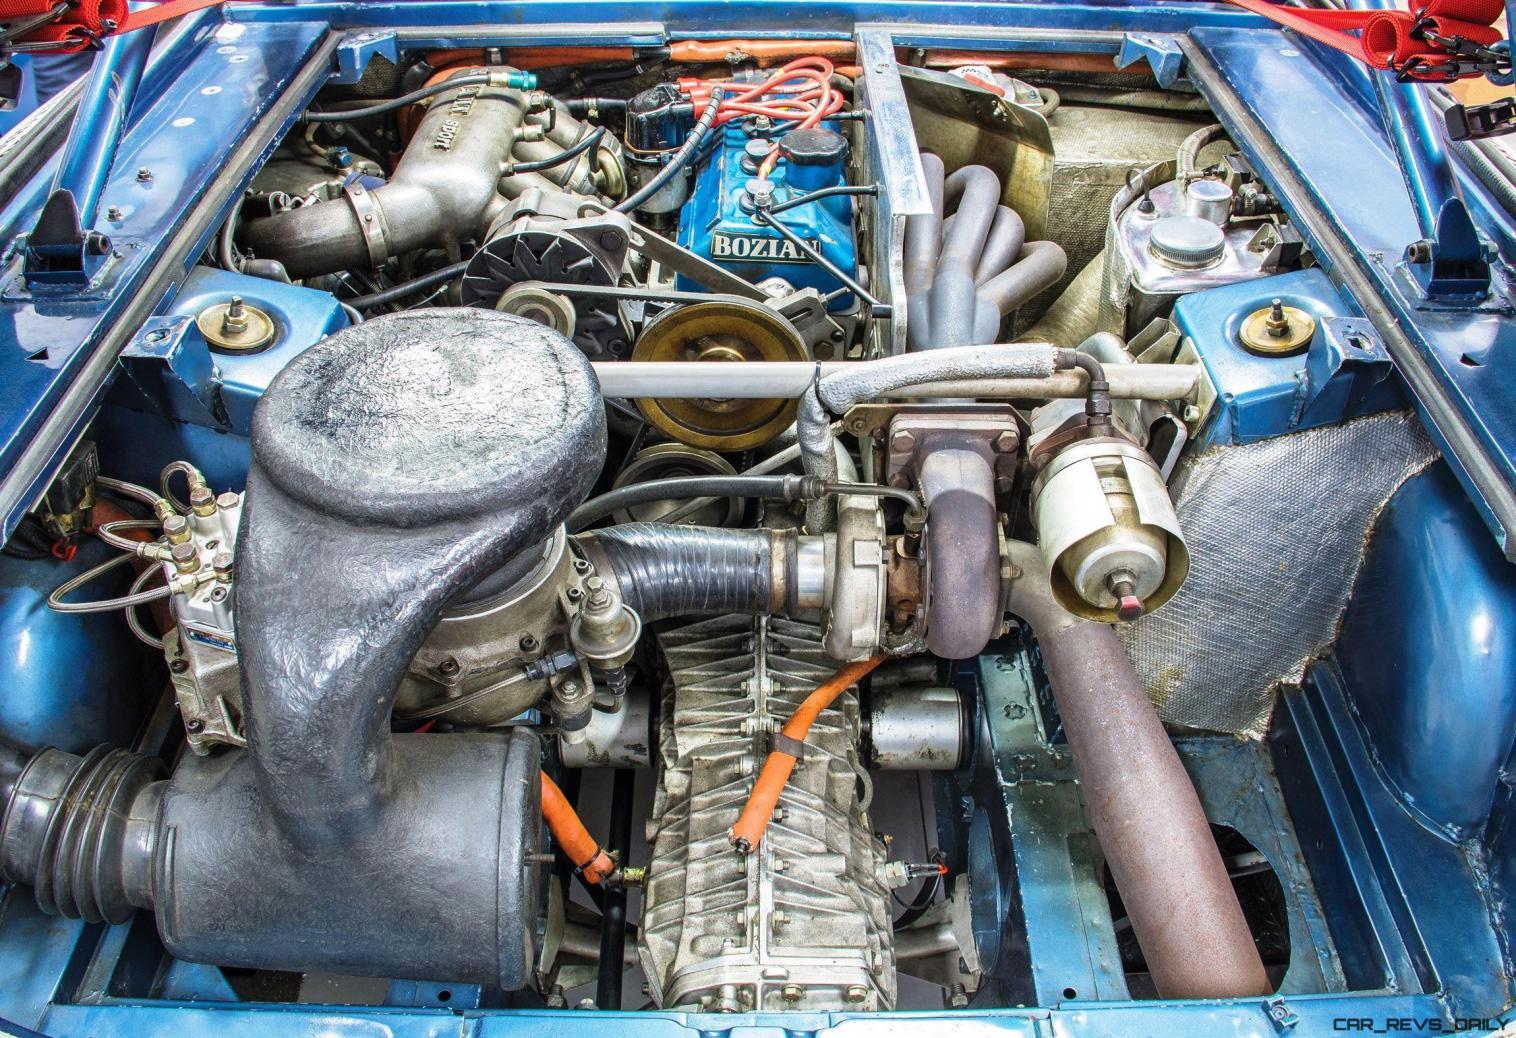 RM Monaco 2016 - 1982 Renault 5 Turbo Group 4 Rally Car 3